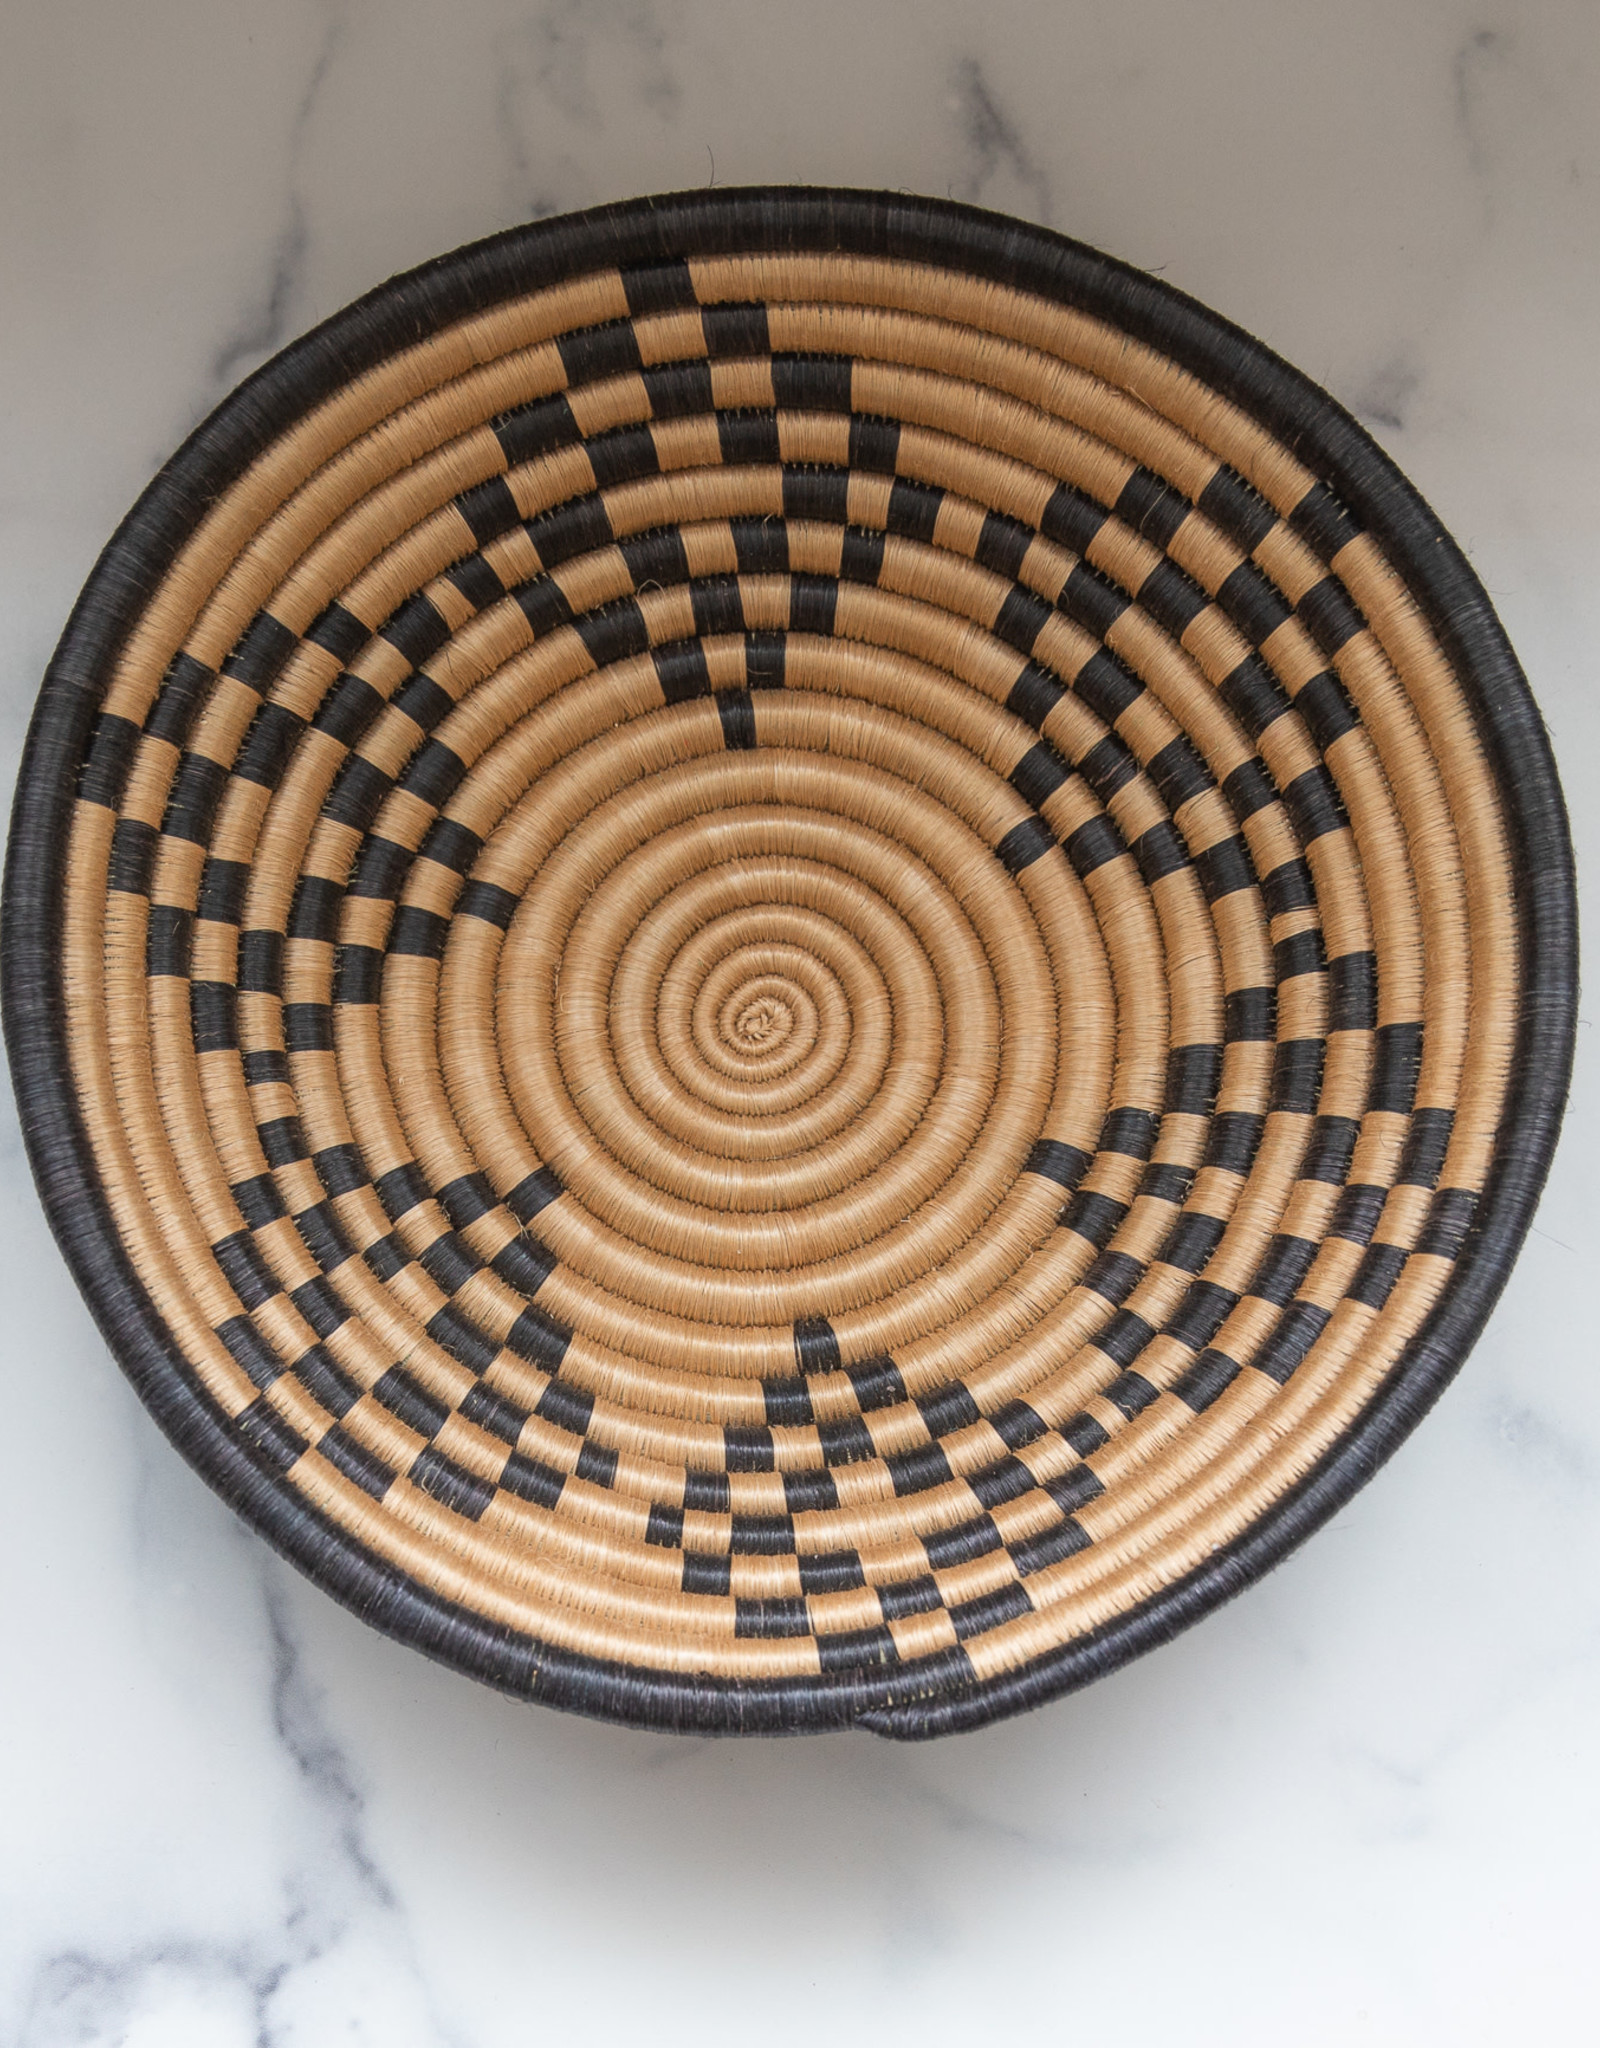 Handmade in Kenya - 12 Inch Bowl #10